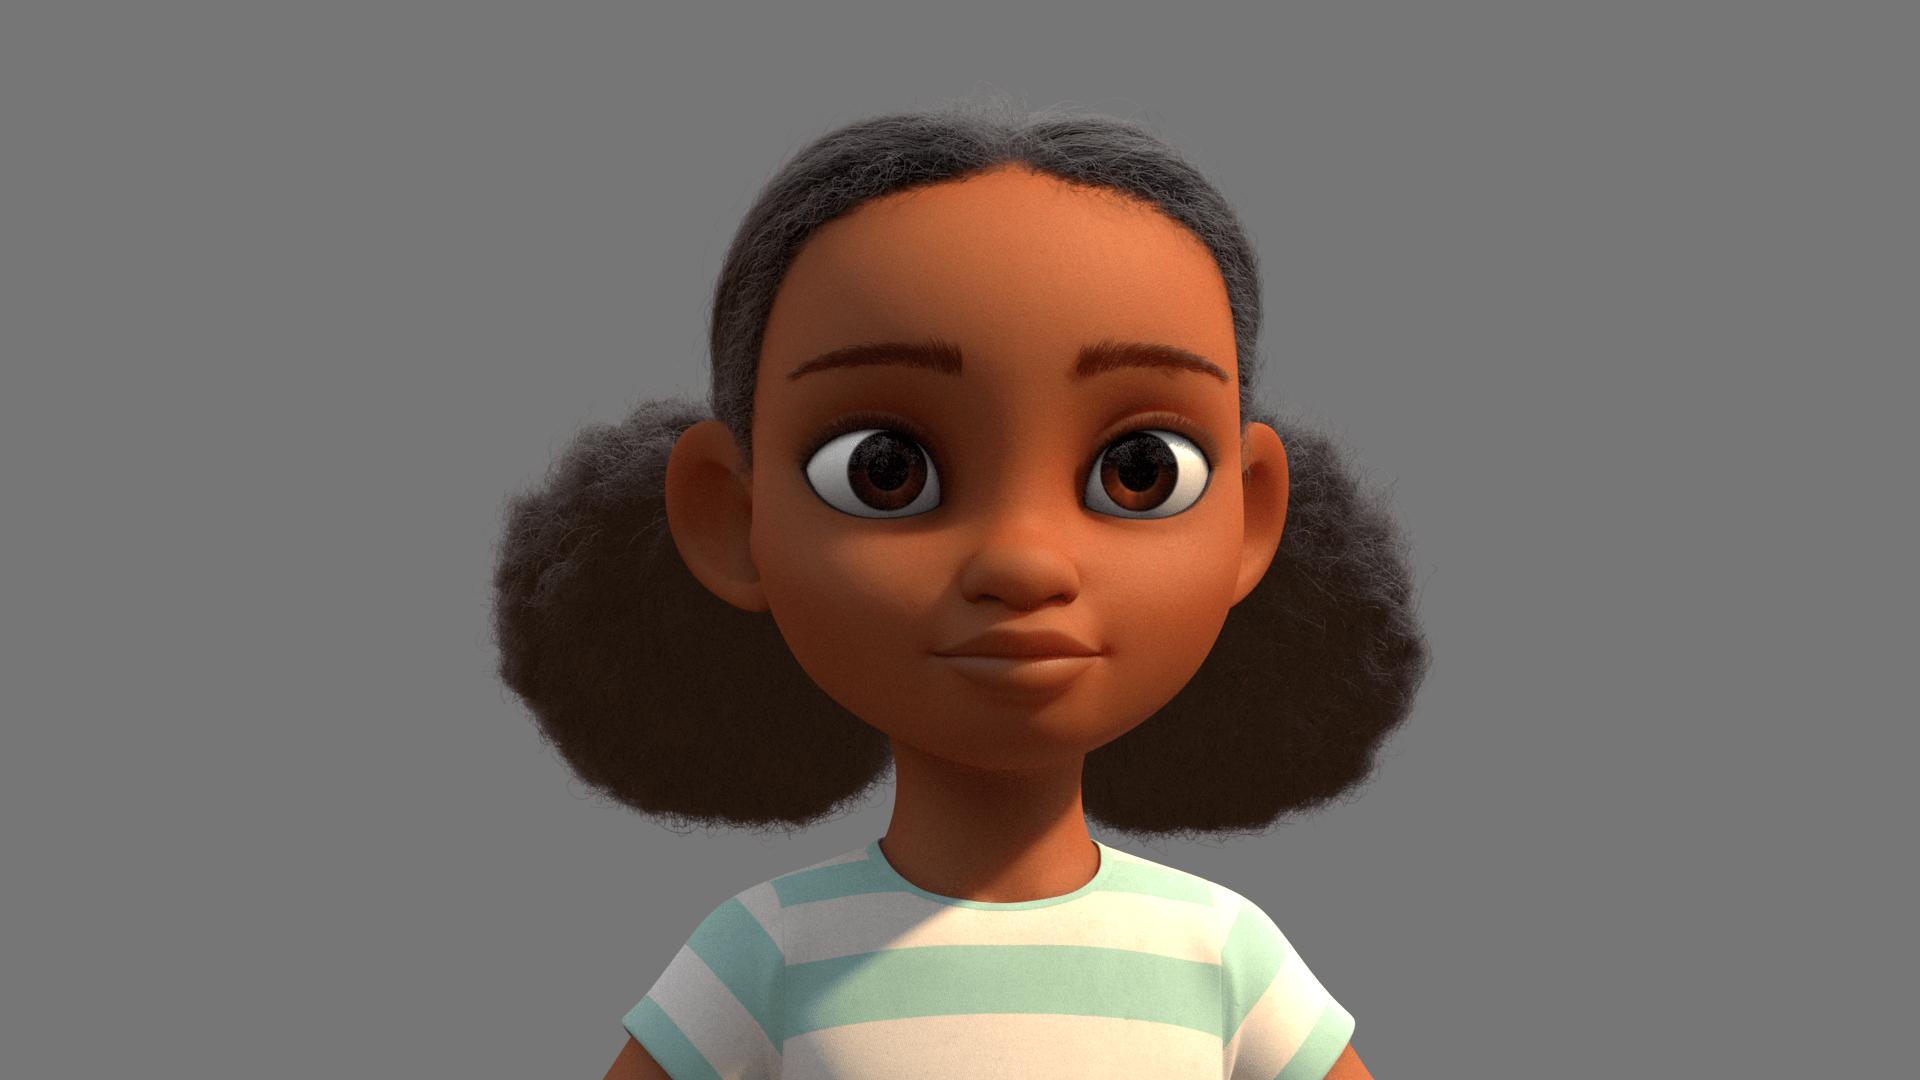 Cartoon Hair – Draw cartoon style